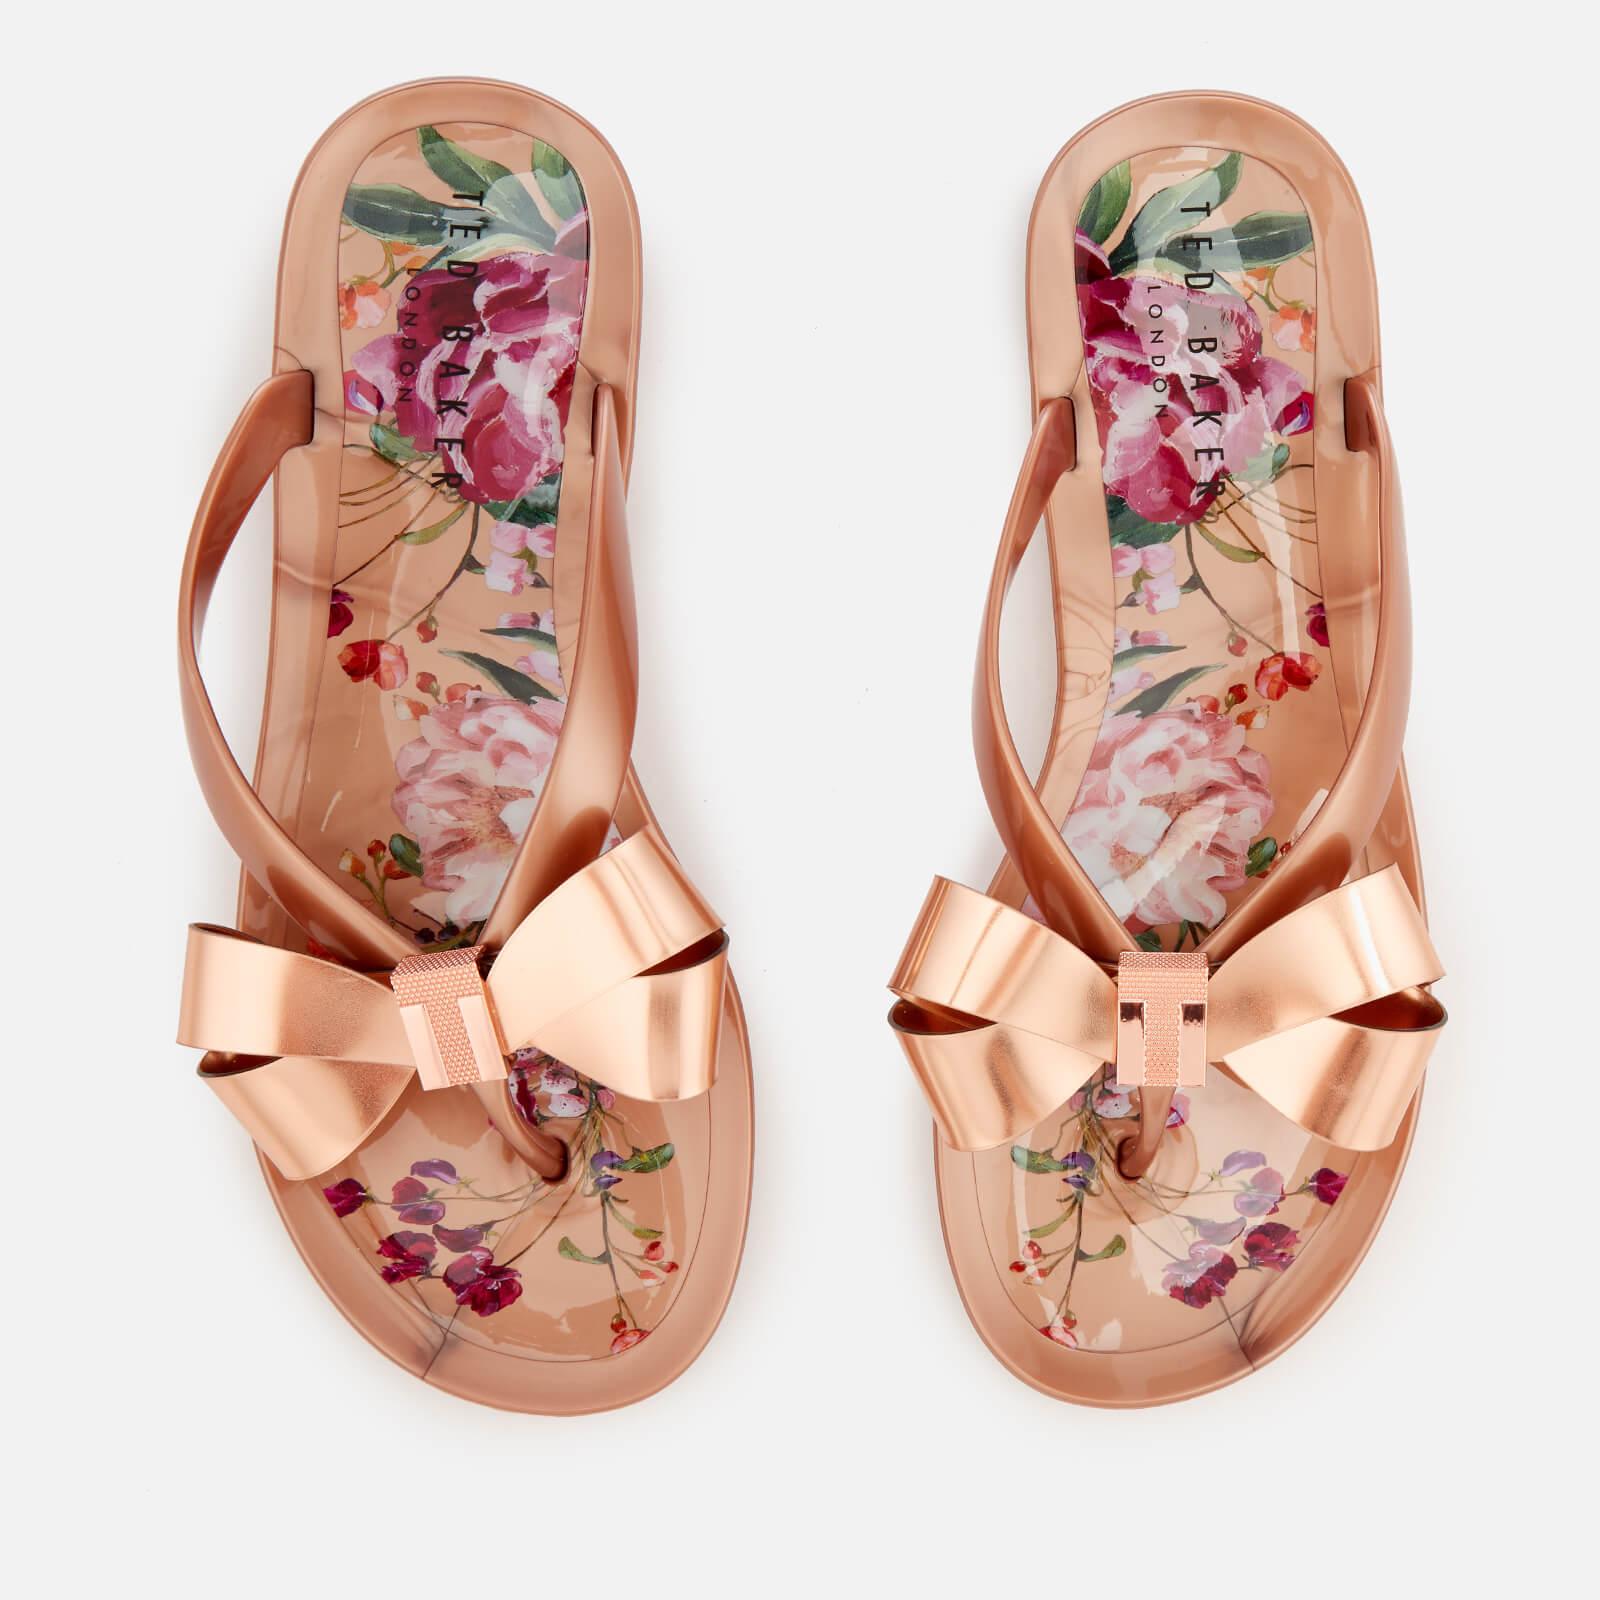 e8668ac2d59f6 Ted Baker Women s Susziep Bow Flip Flops - Serenity Rose Gold